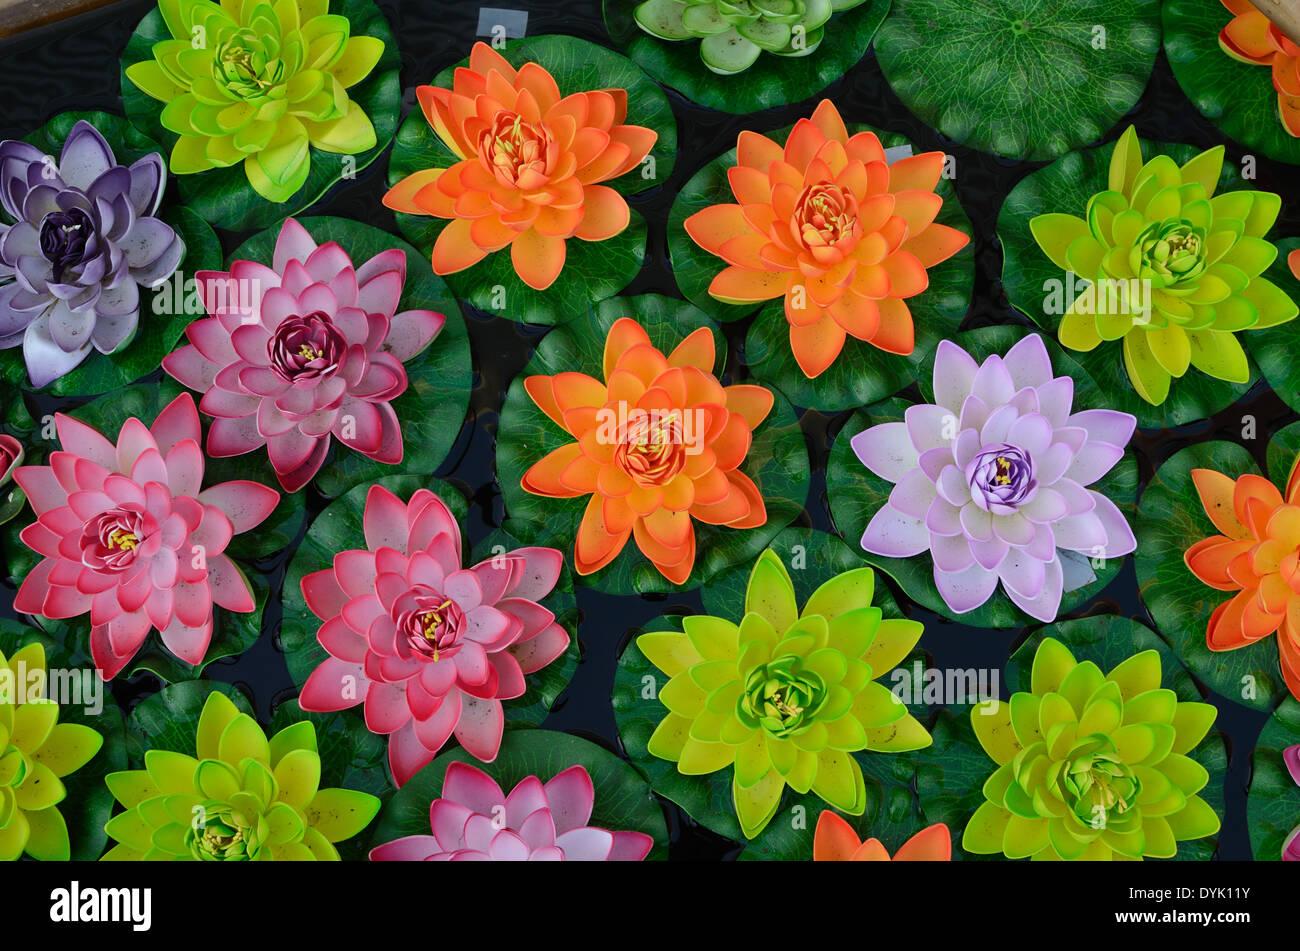 Multicolored Plastic Lotus Flowers Or Blooms Of Floating Water